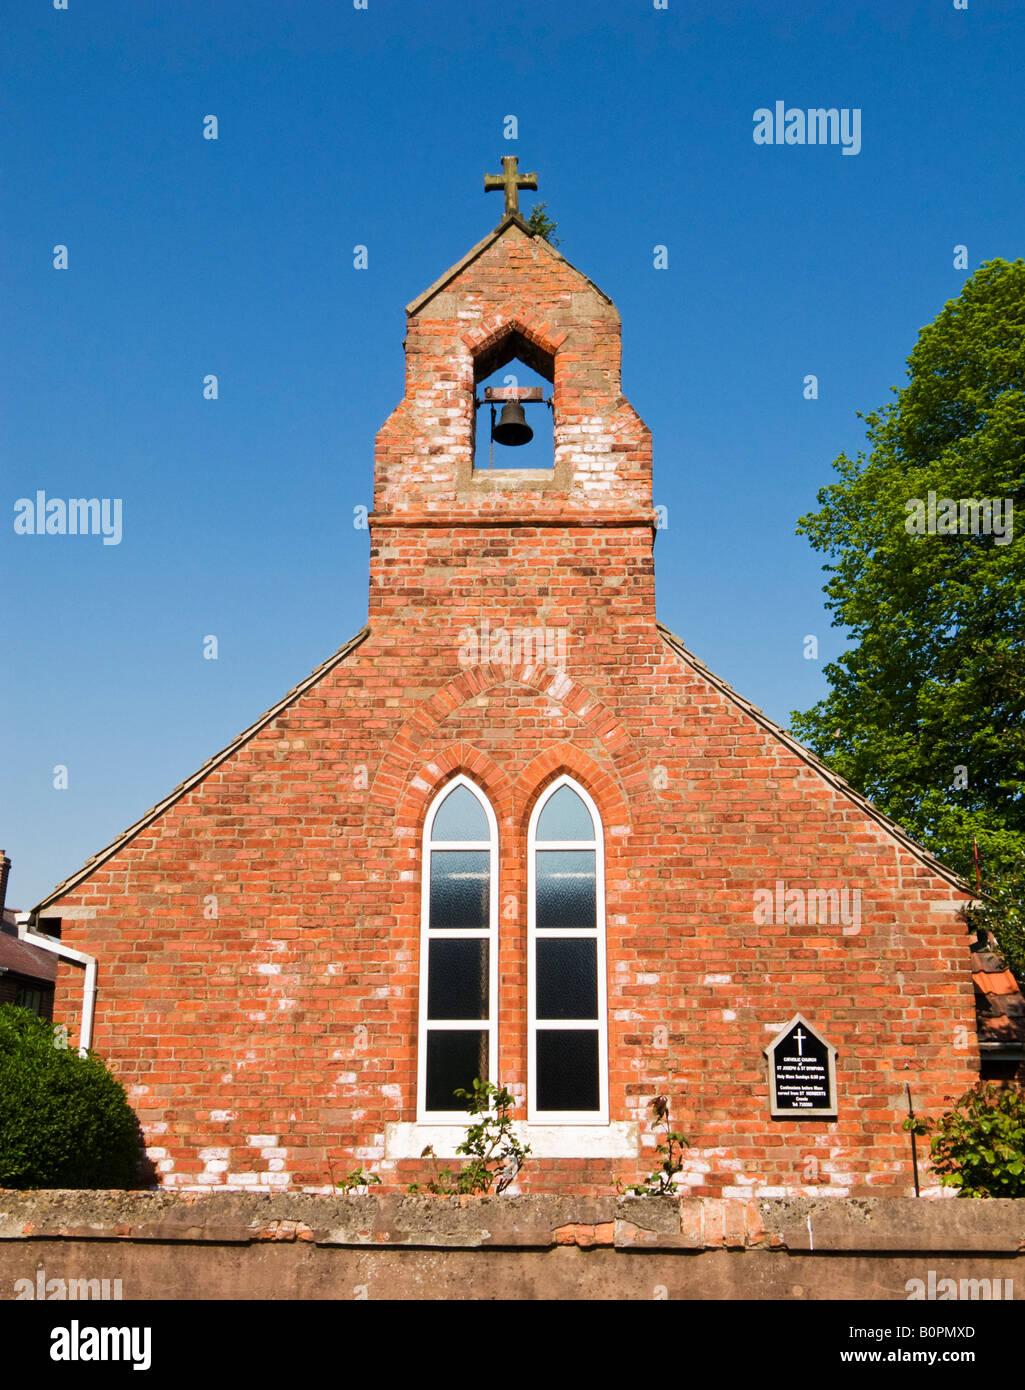 St Joseph and St Dymphna Catholic Church Luddington Isle of Axholme North Lincolnshire England UK - Stock Image